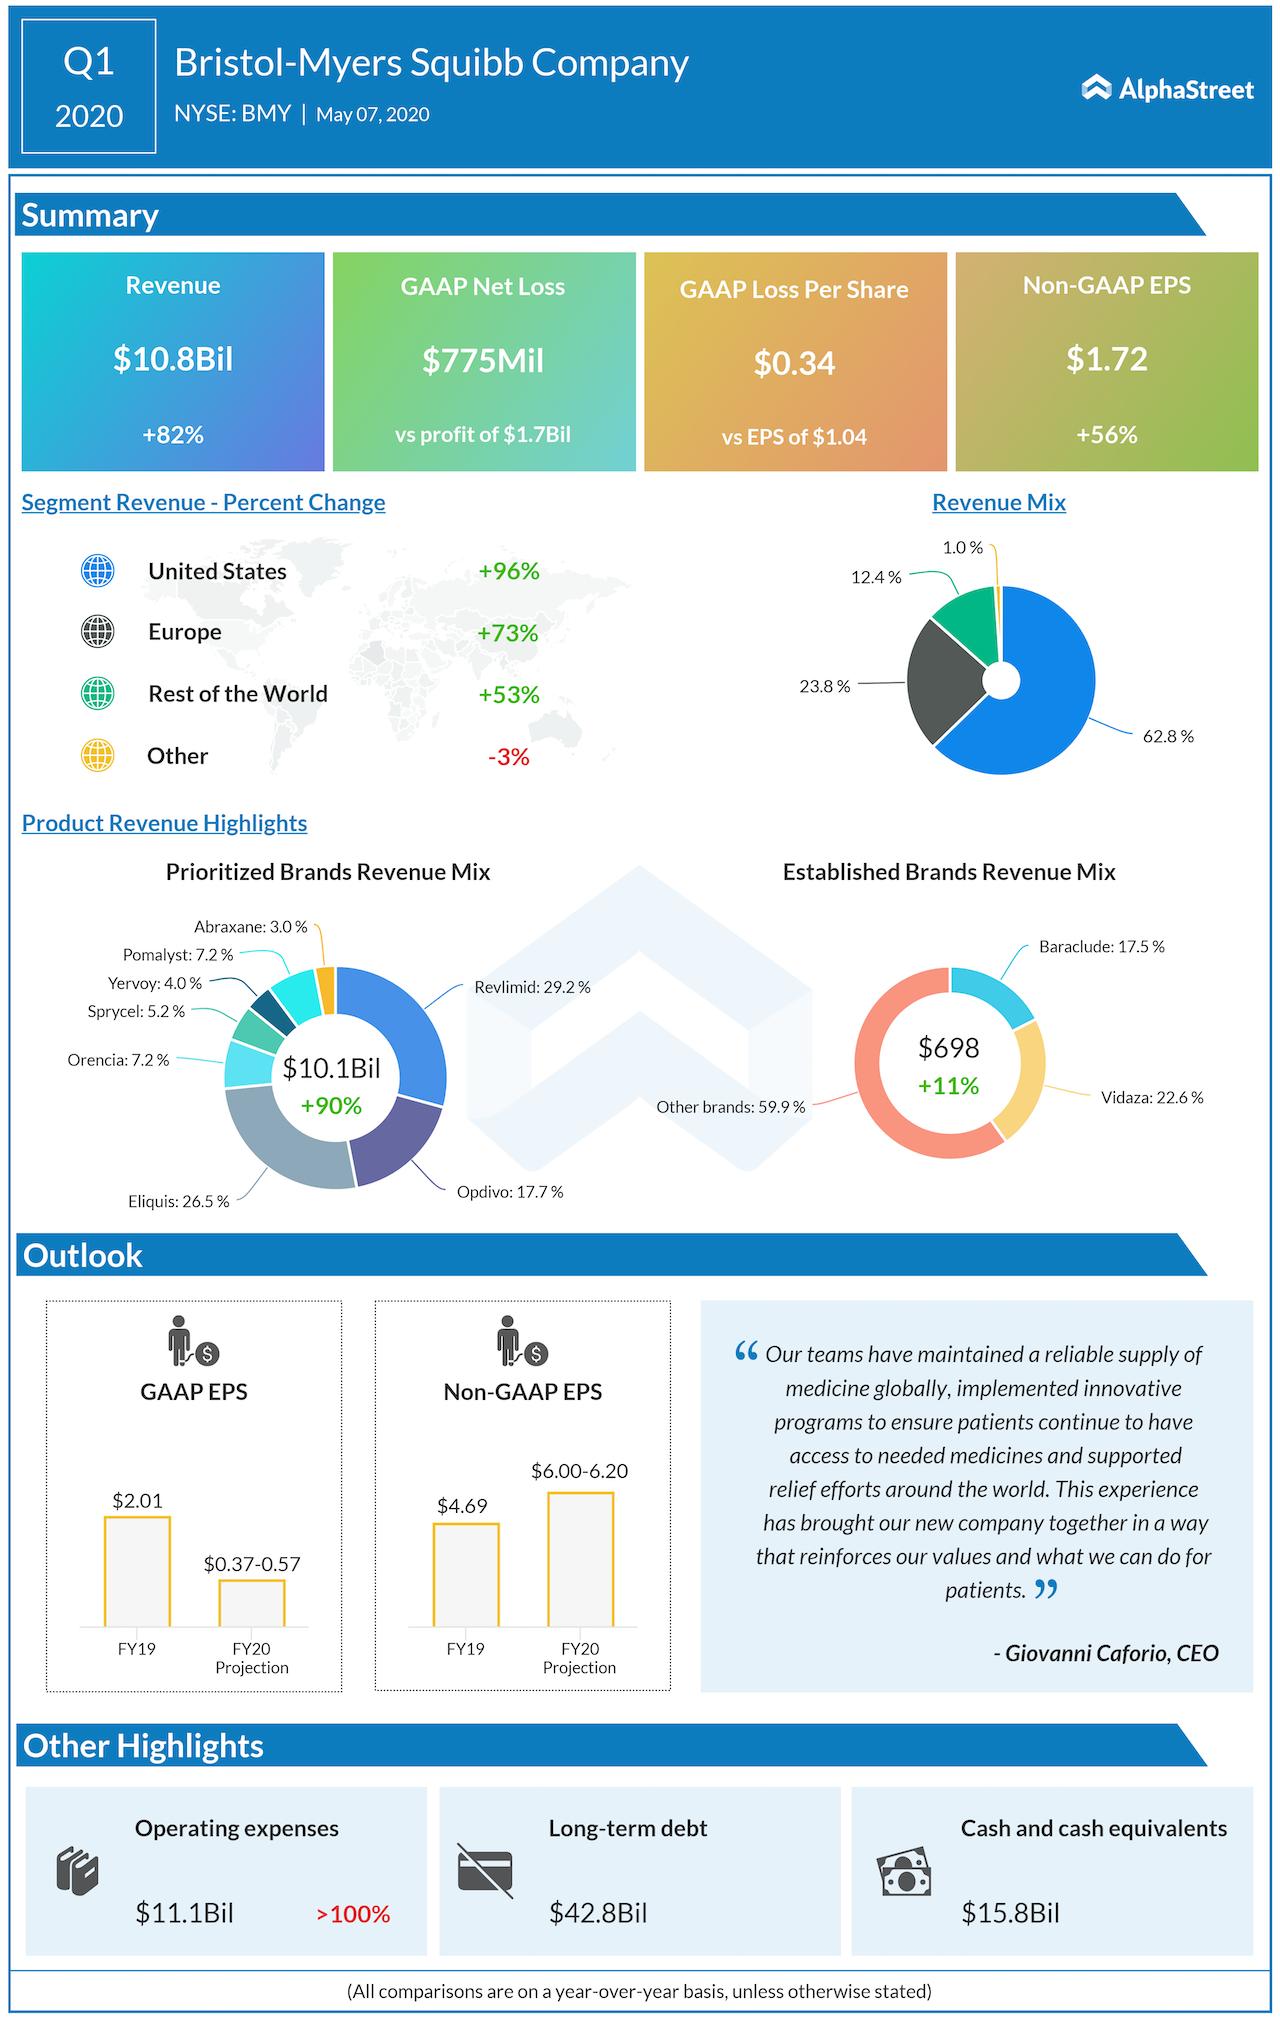 bristol-myers squibb Q1 2020 earnings